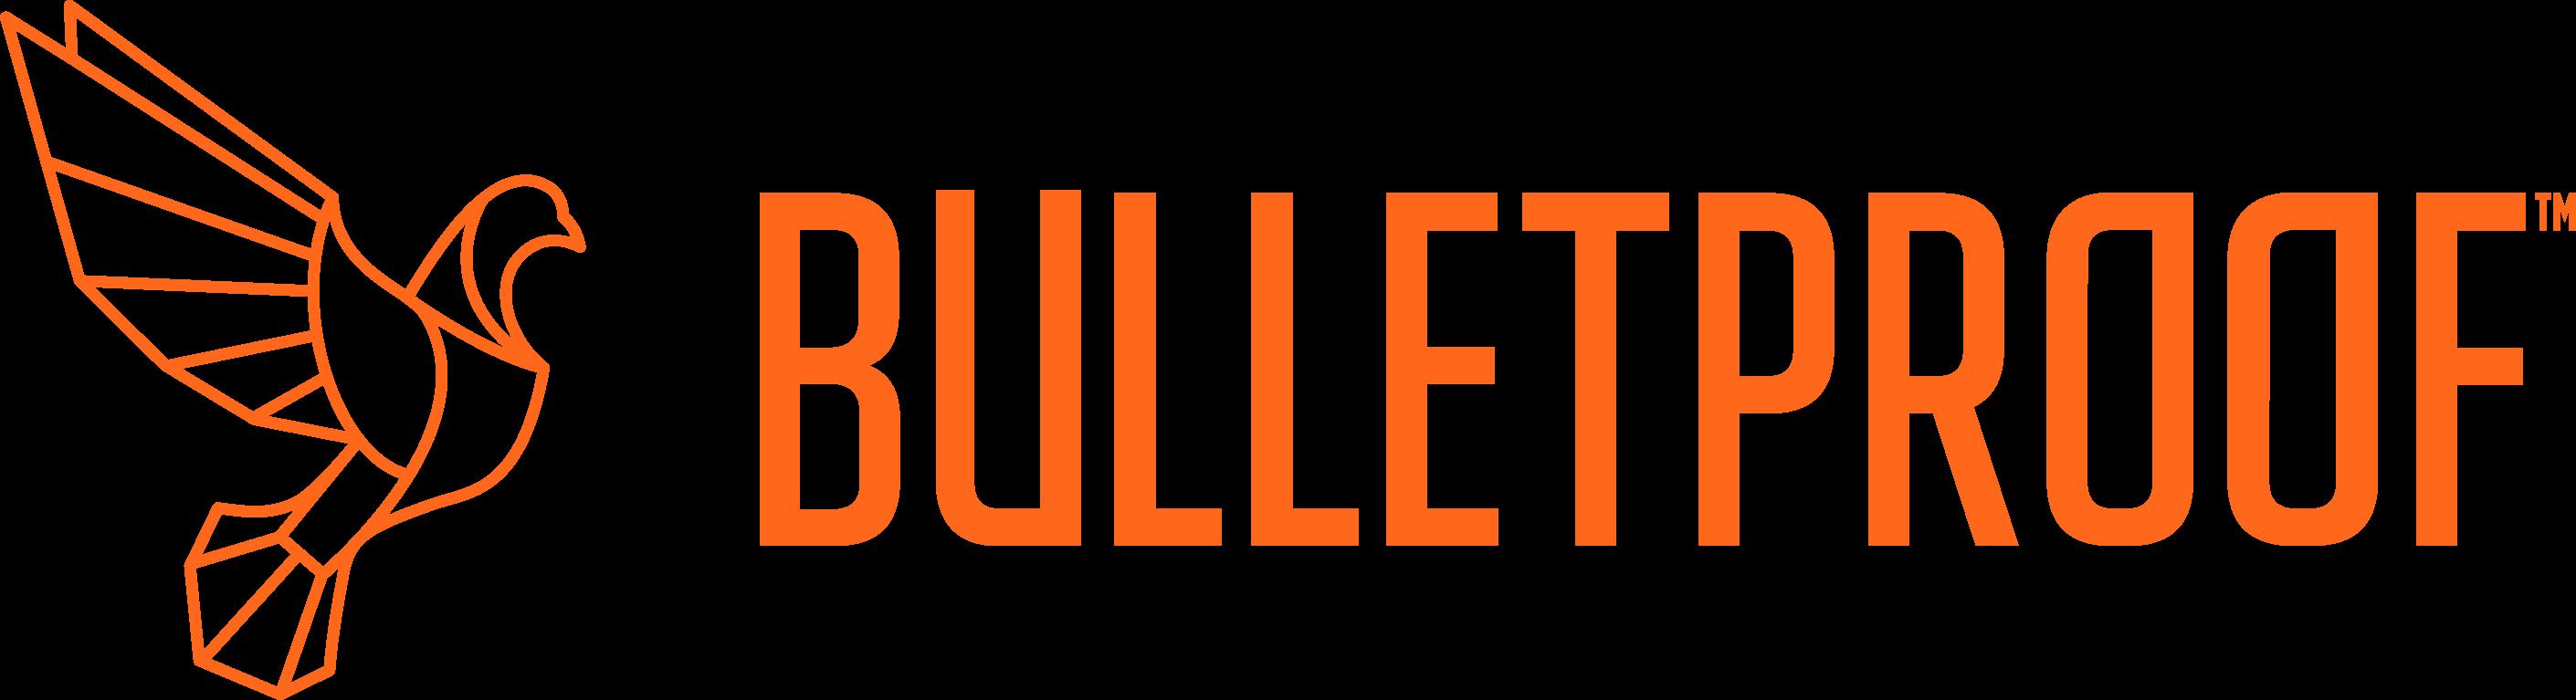 Bulletproof Logo png